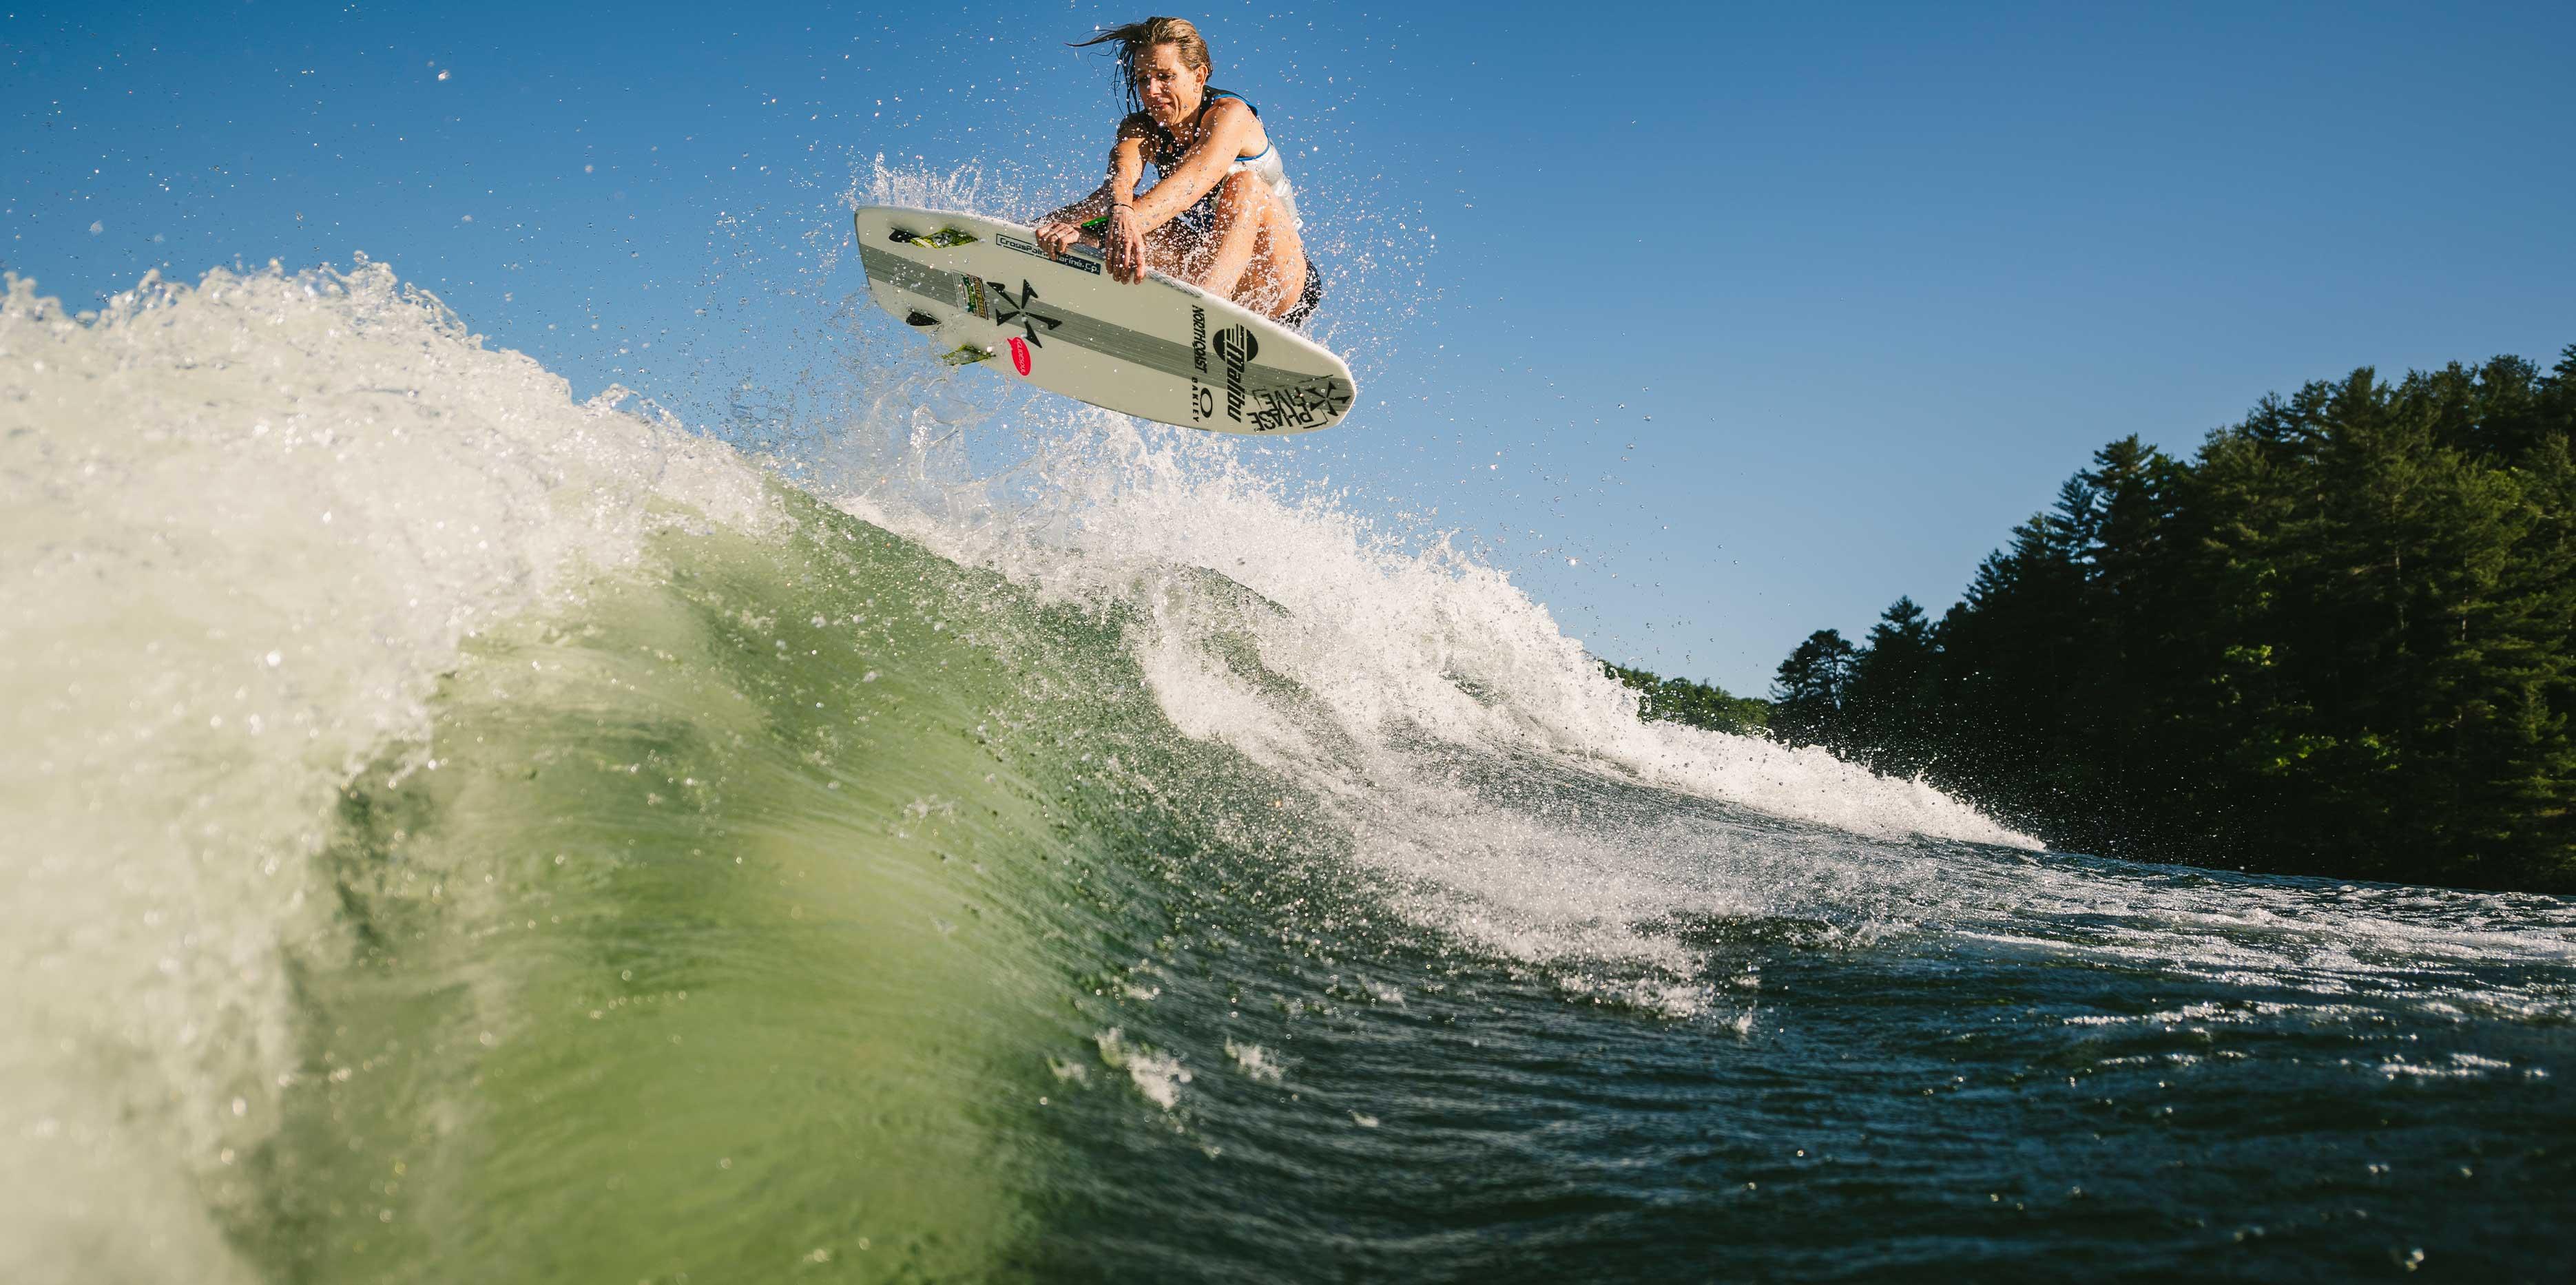 Wakesurfing behind the 25 LSV